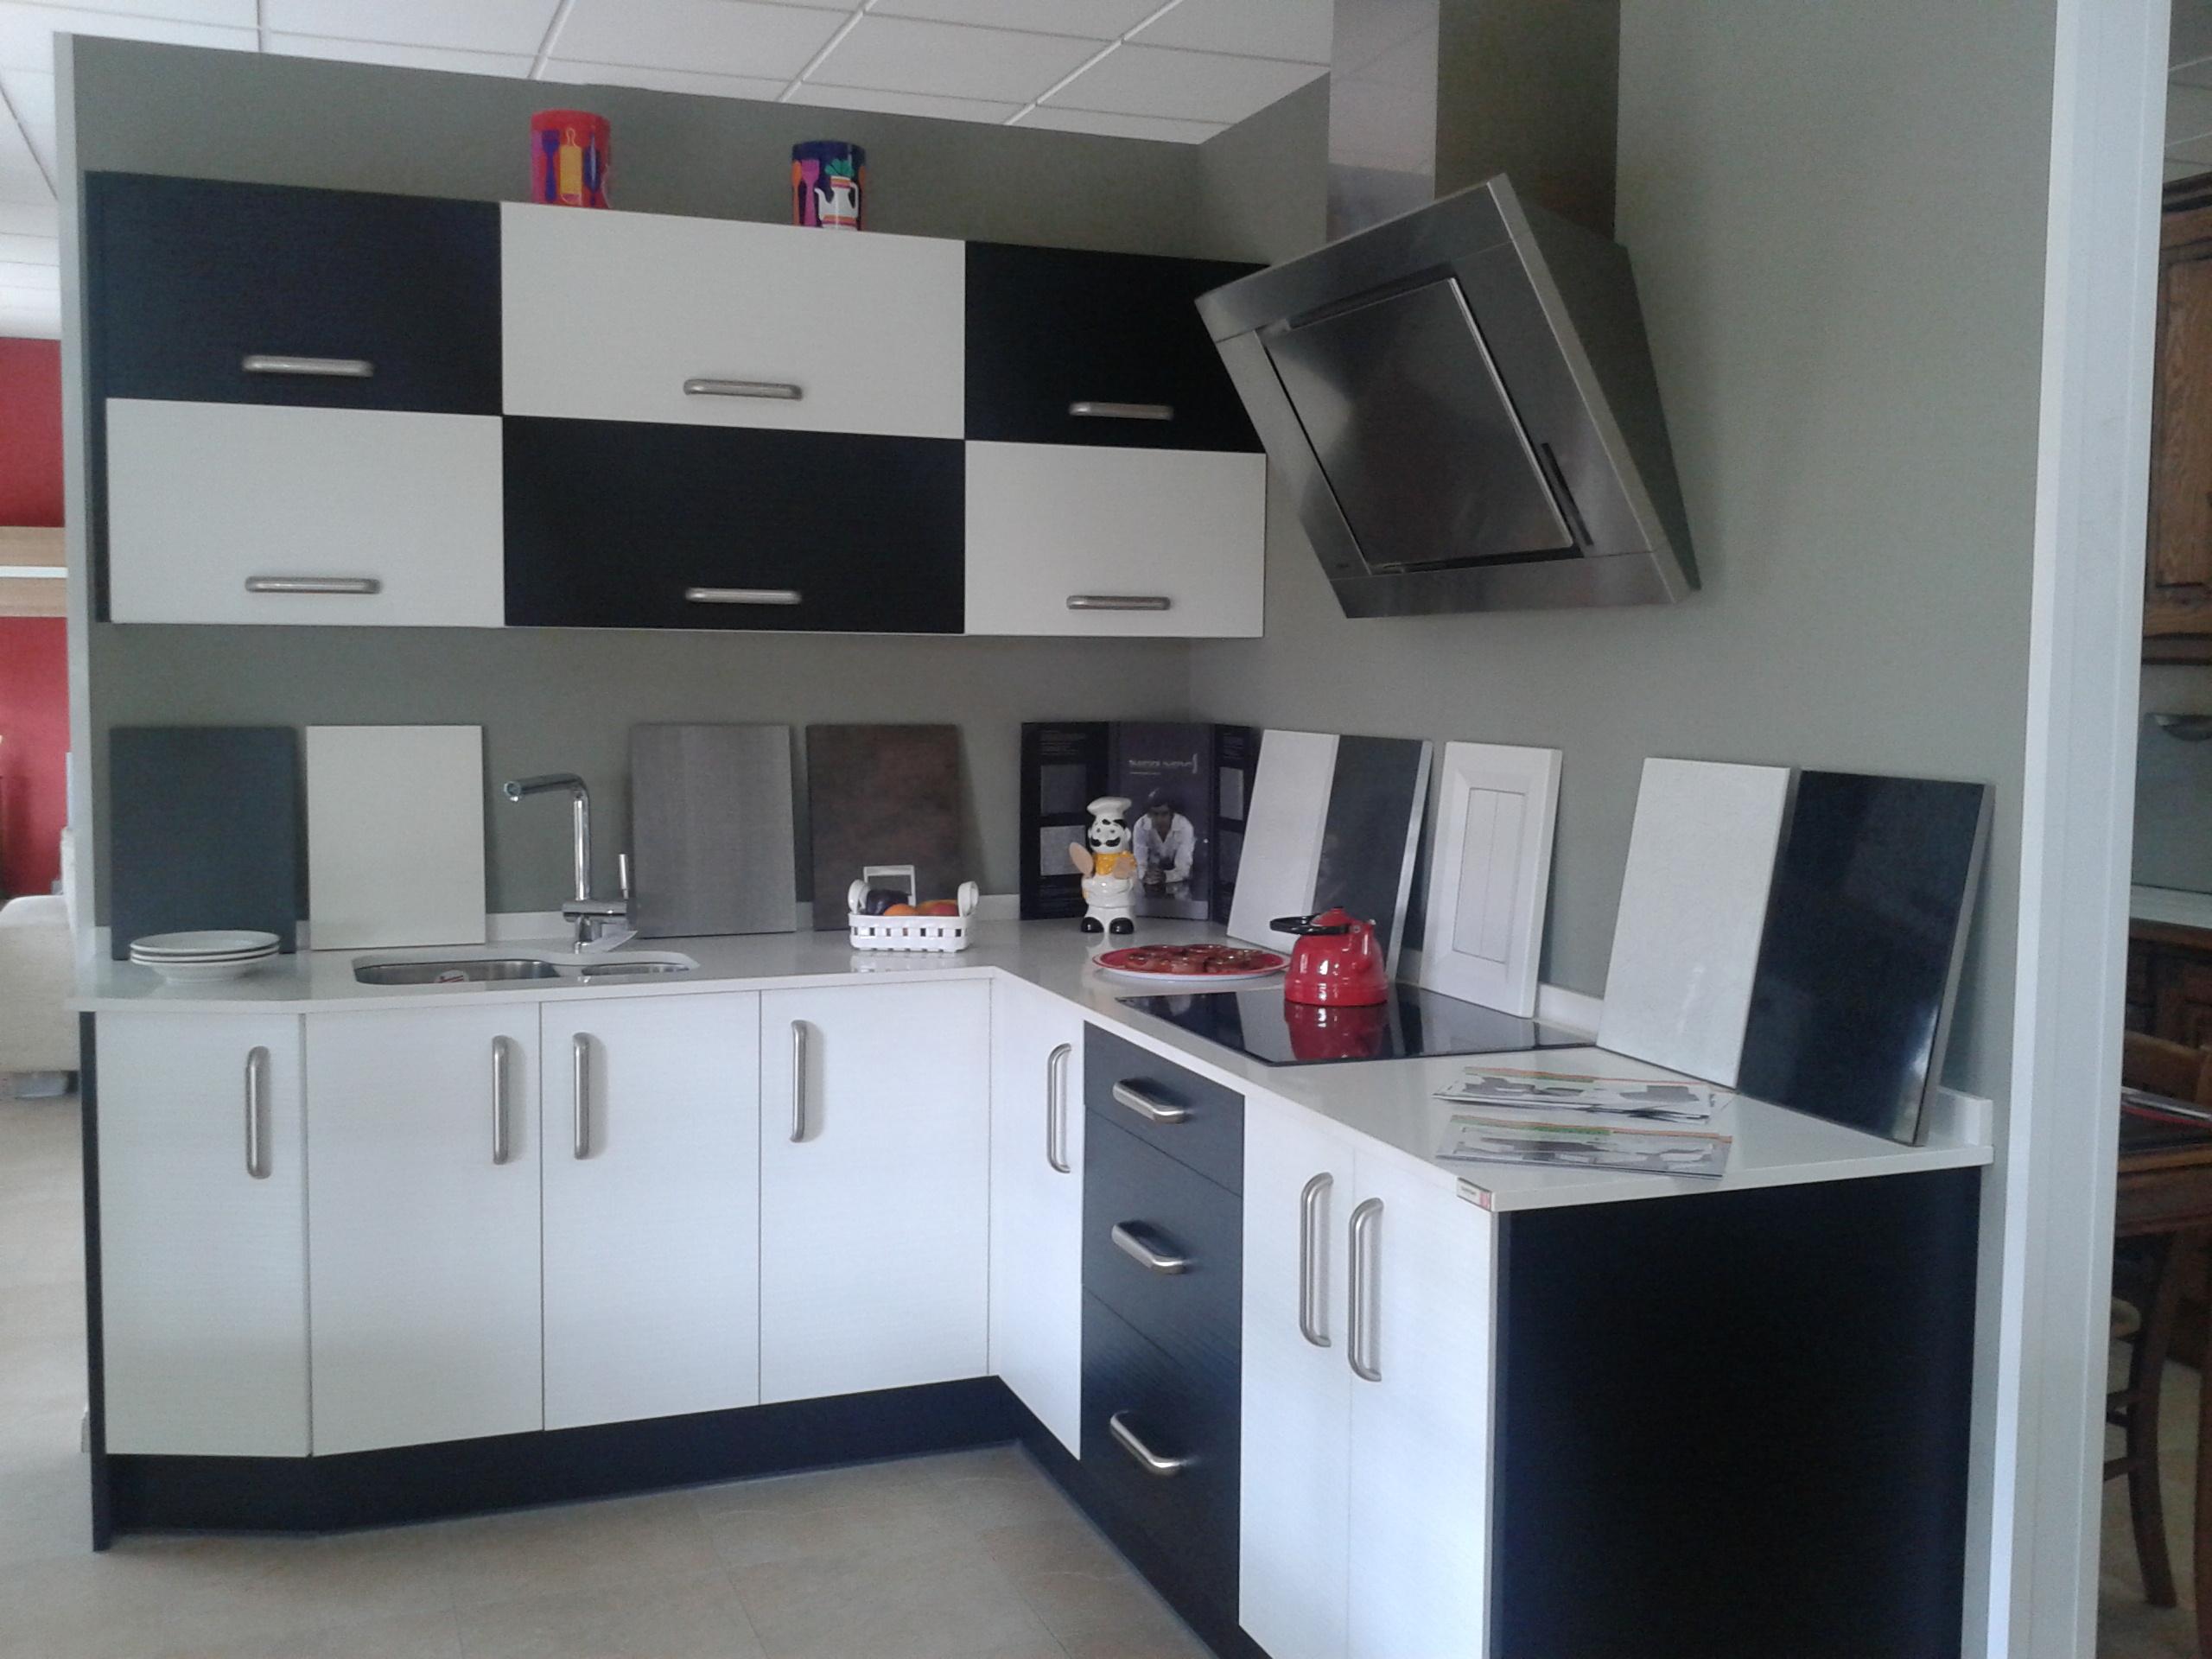 Muebles de cocina - Muebles de cocina merkamueble ...